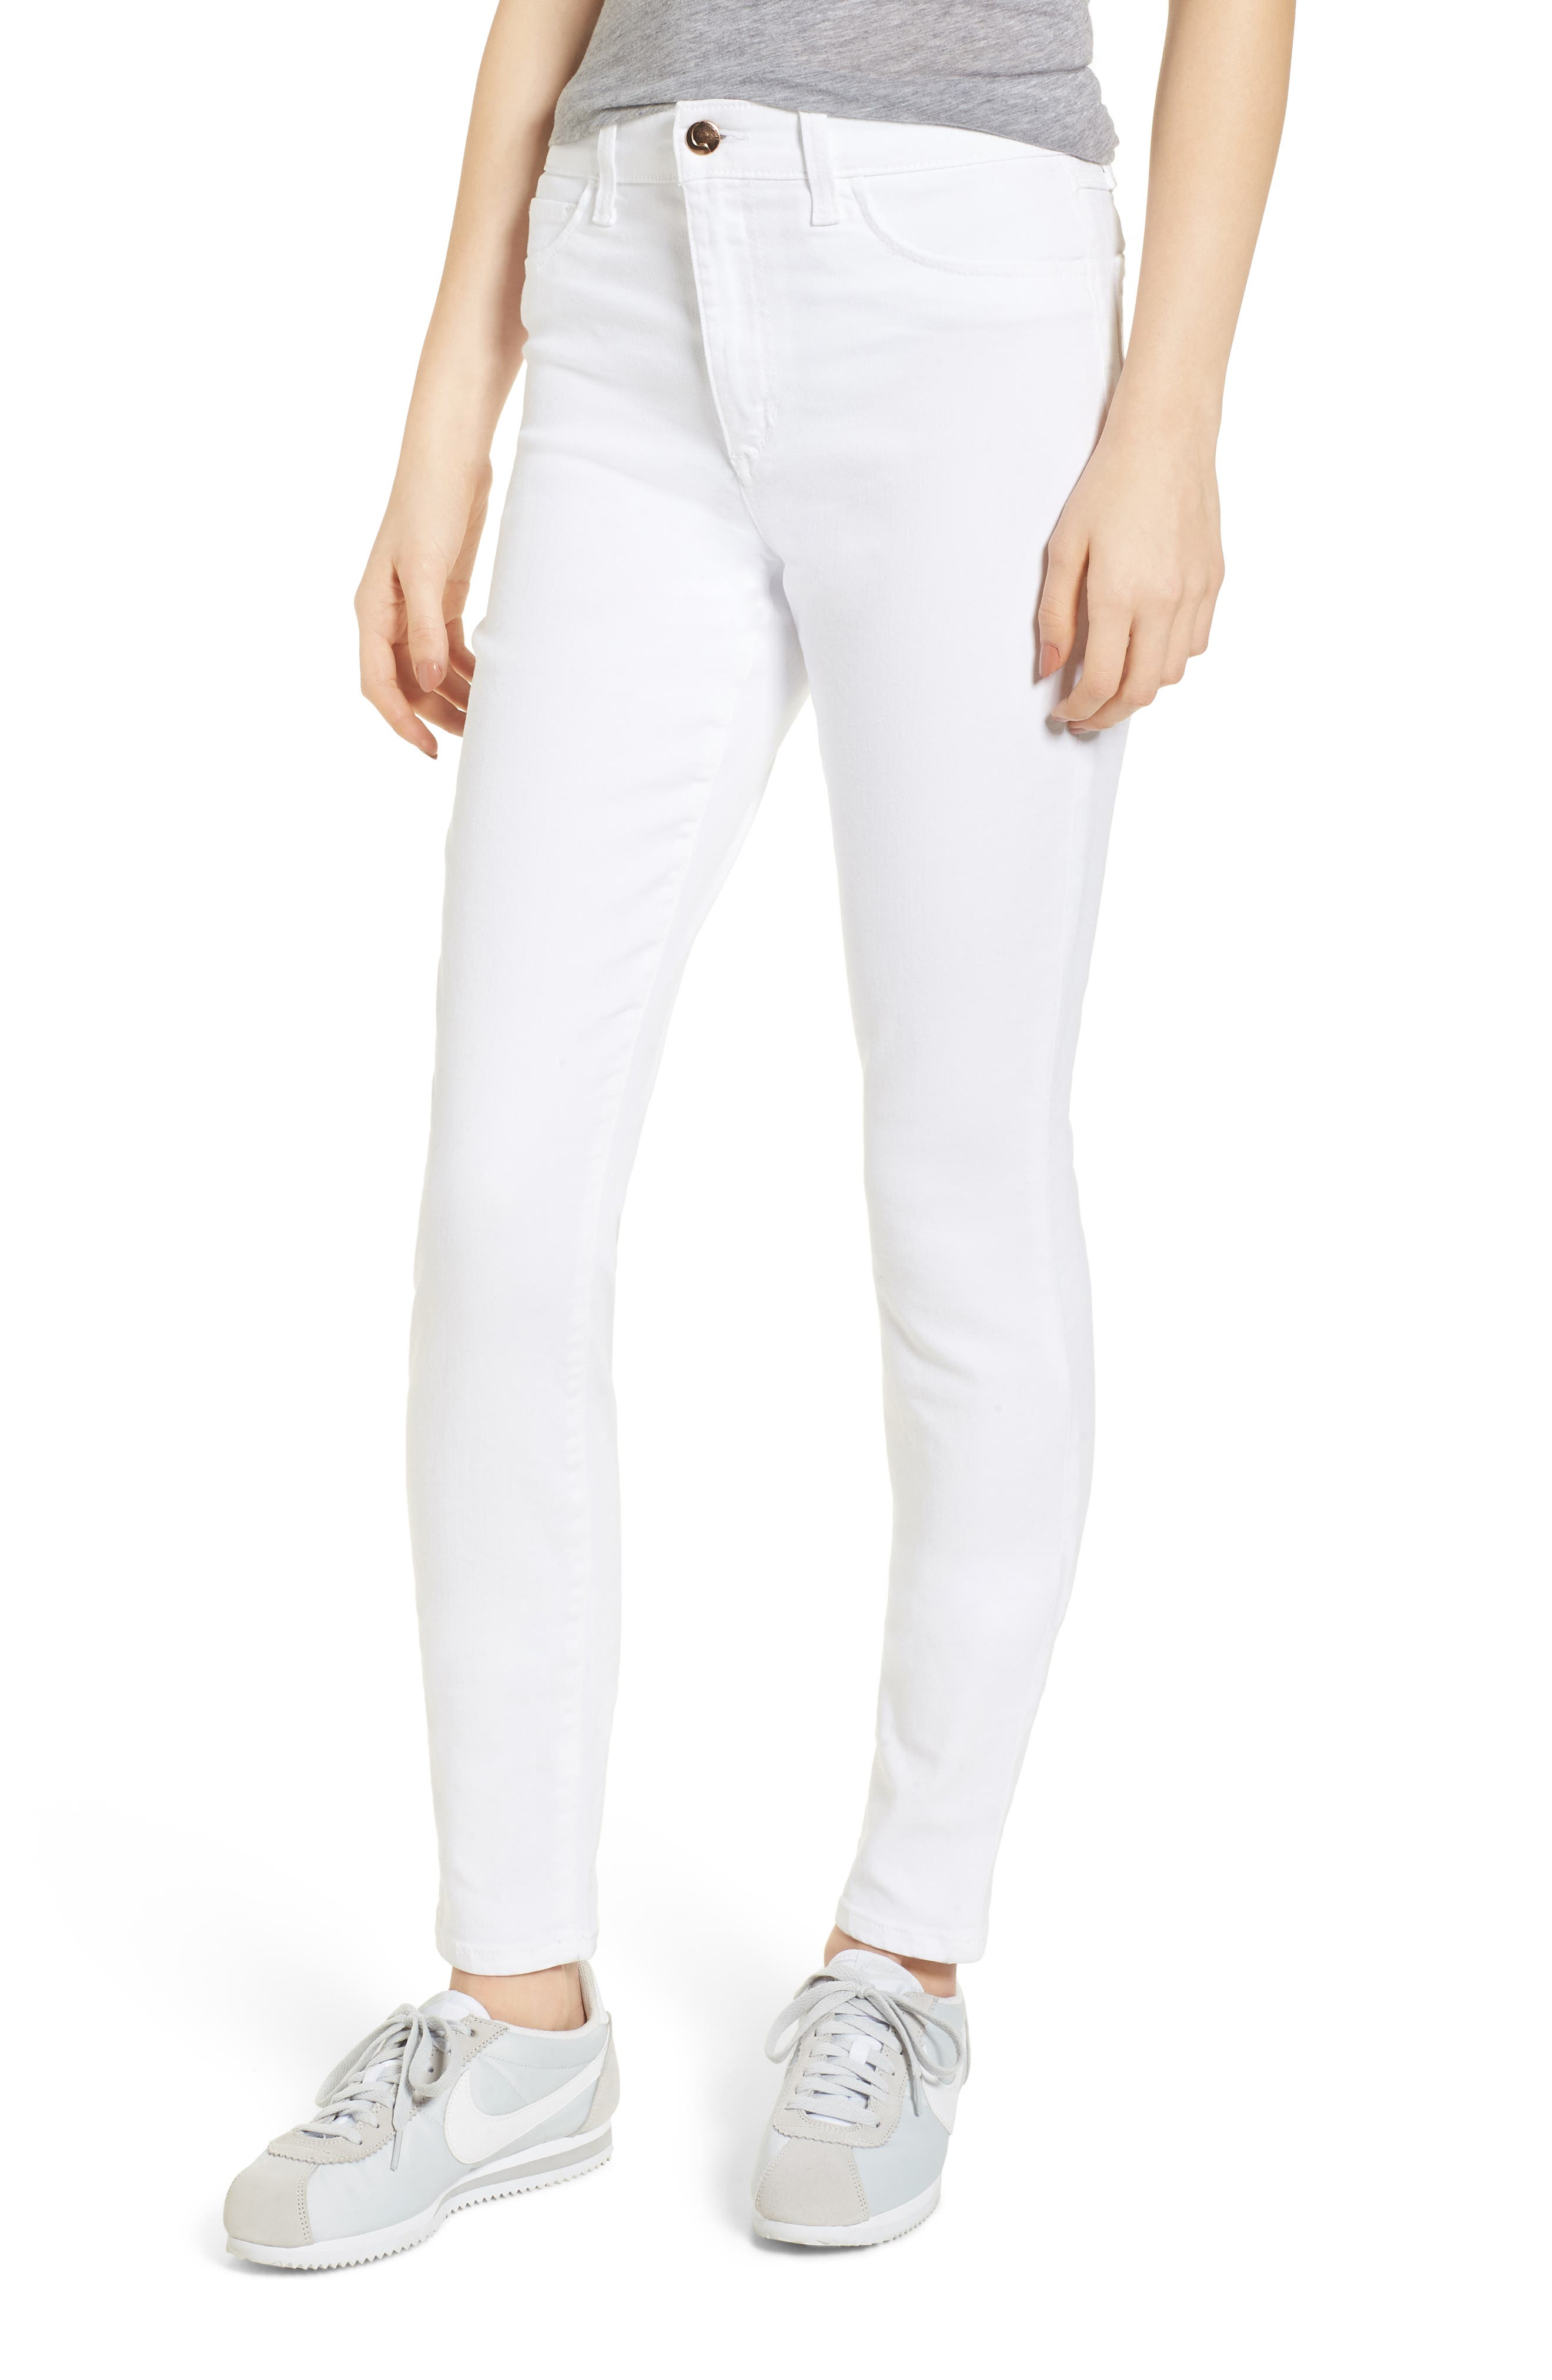 Charlie Skinny Jeans,                             Main thumbnail 1, color,                             120